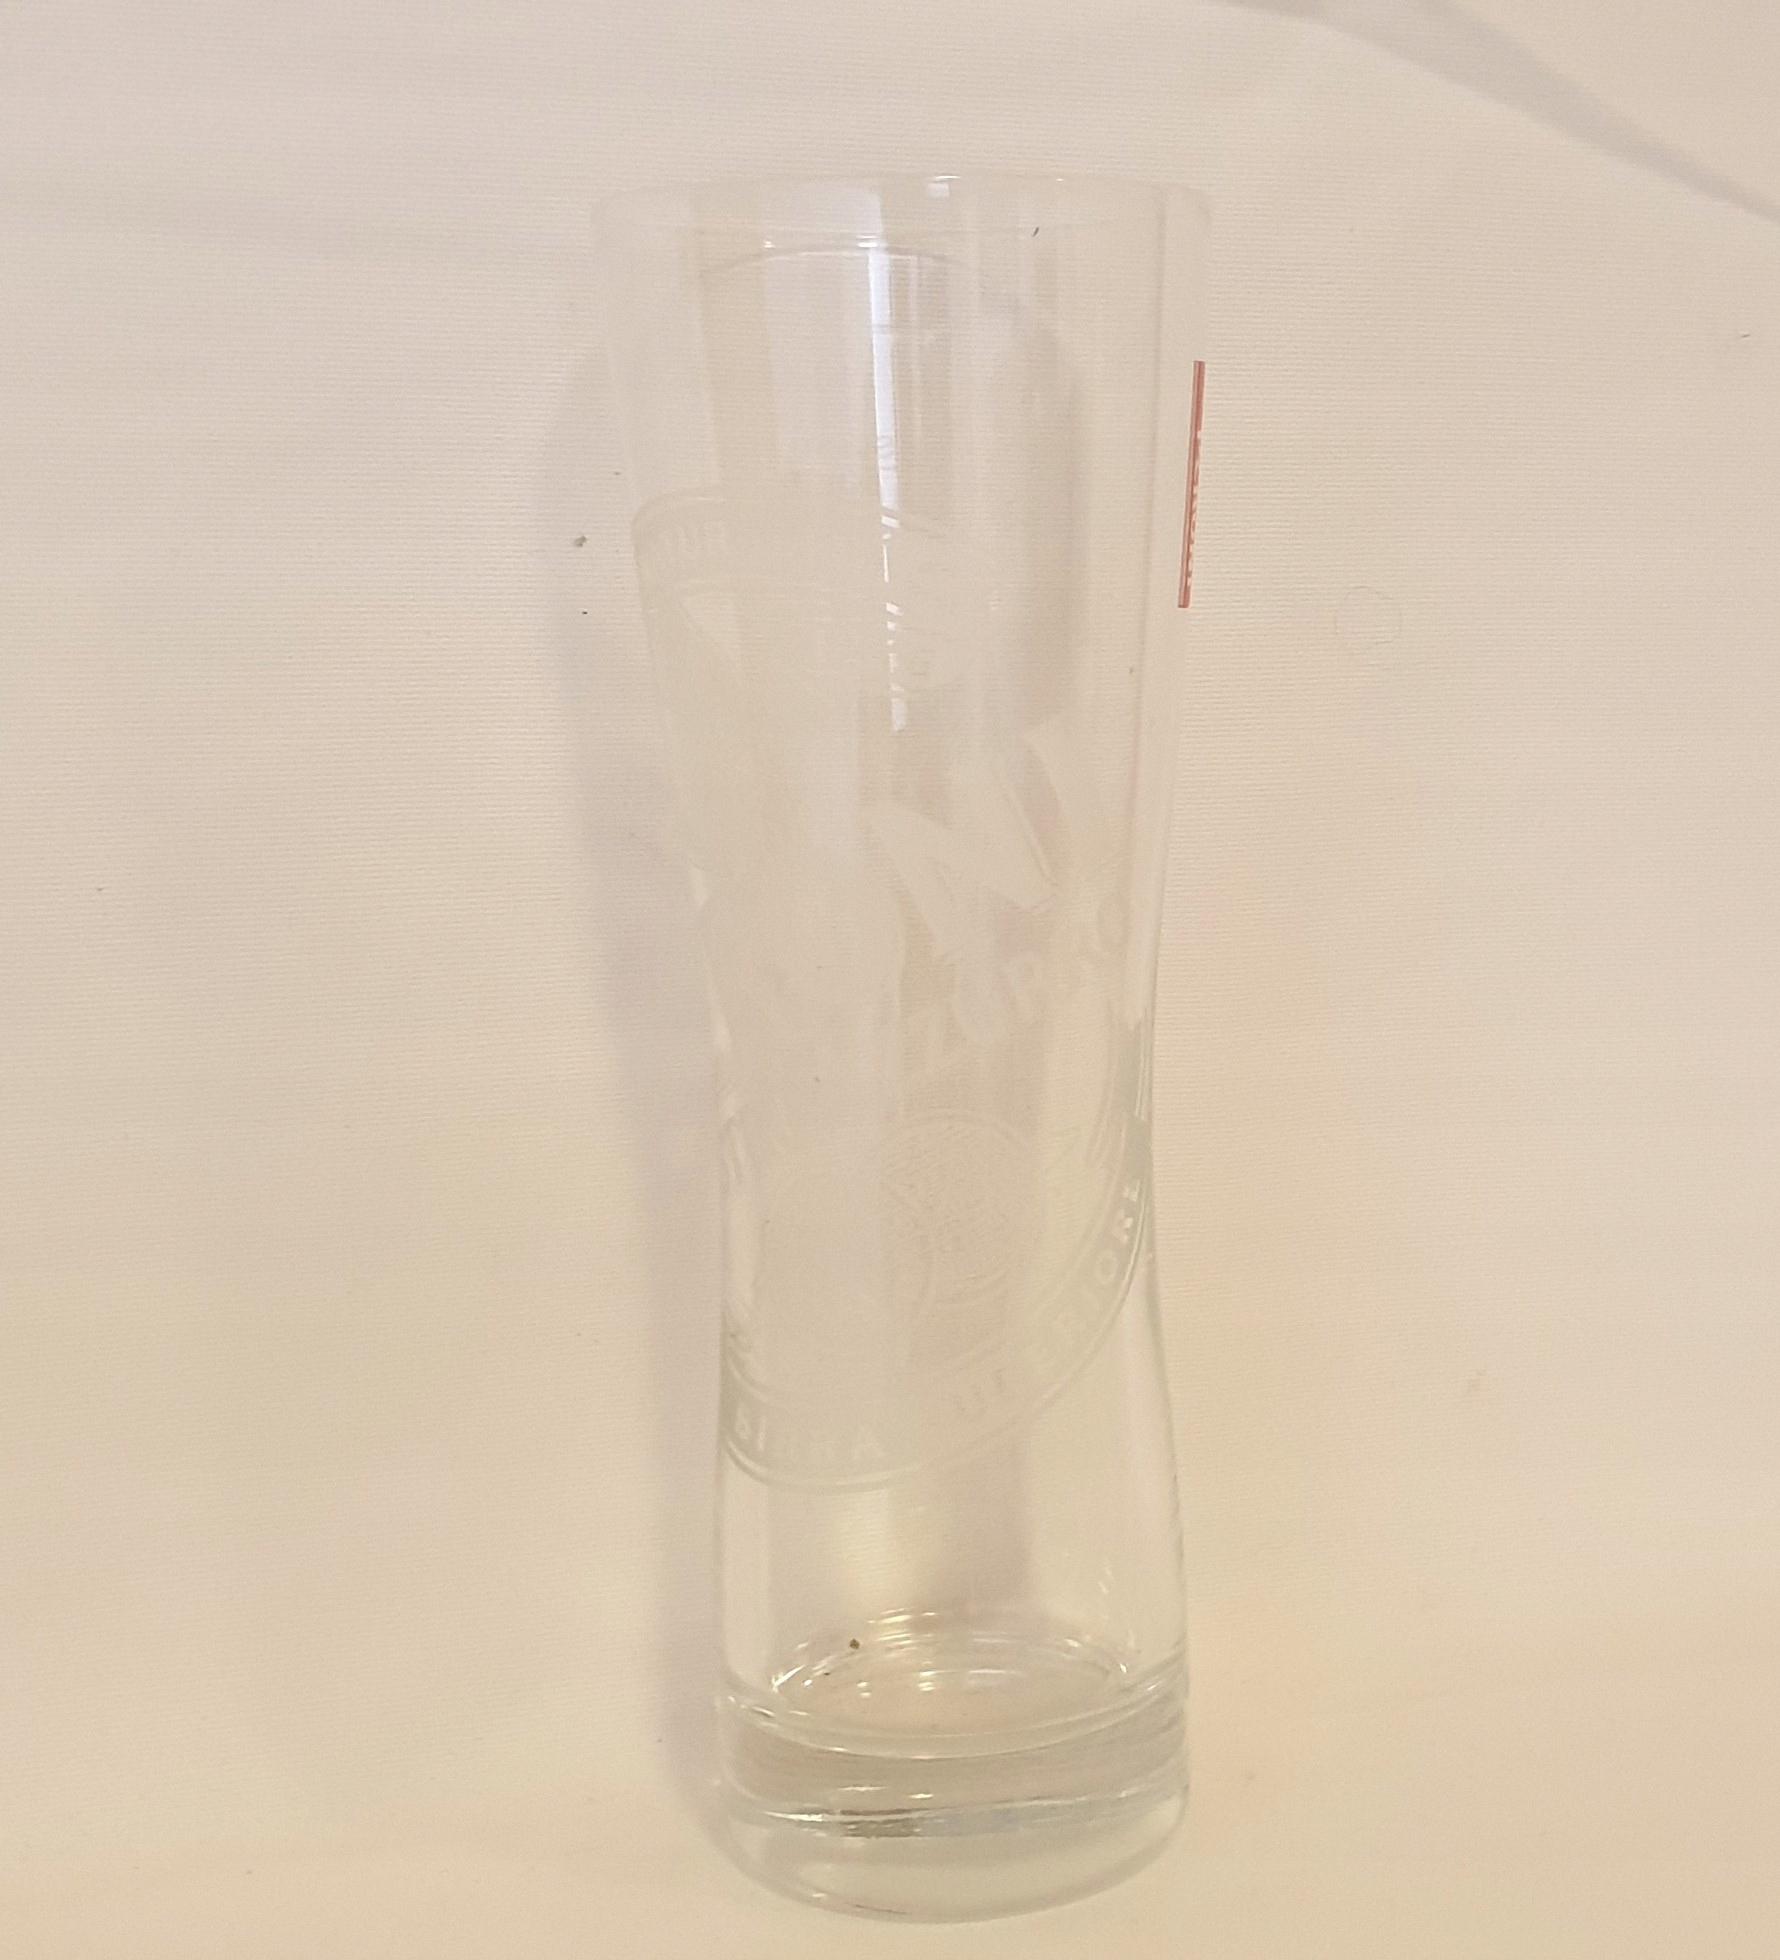 Peroni szklanka 0,4 litra